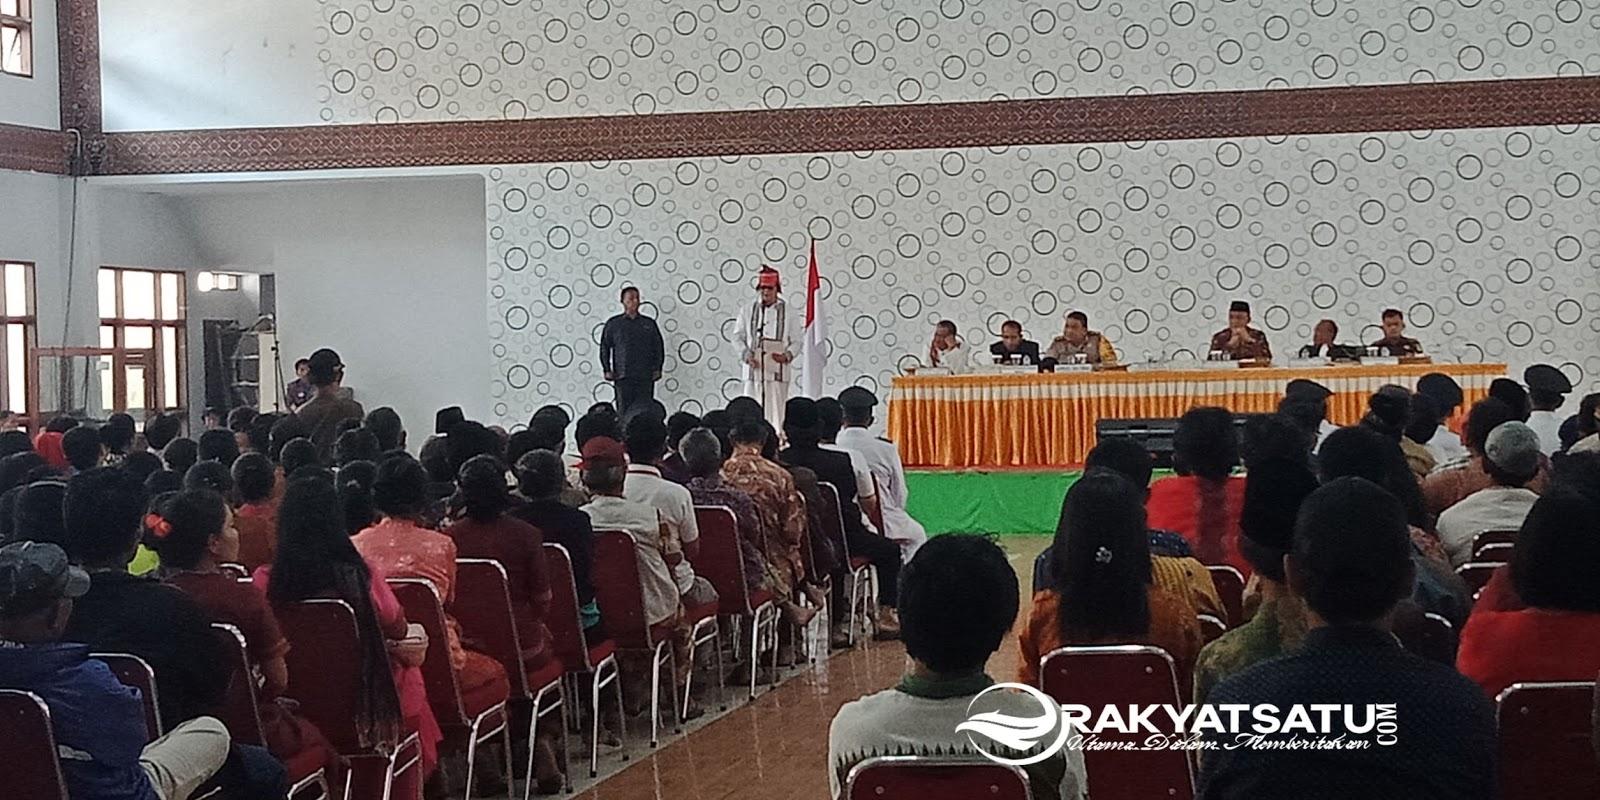 Bupati Tana Toraja Akan Kampanyekan Salah Satu Paslon Capres-Cawapres, Selama 3 Hari